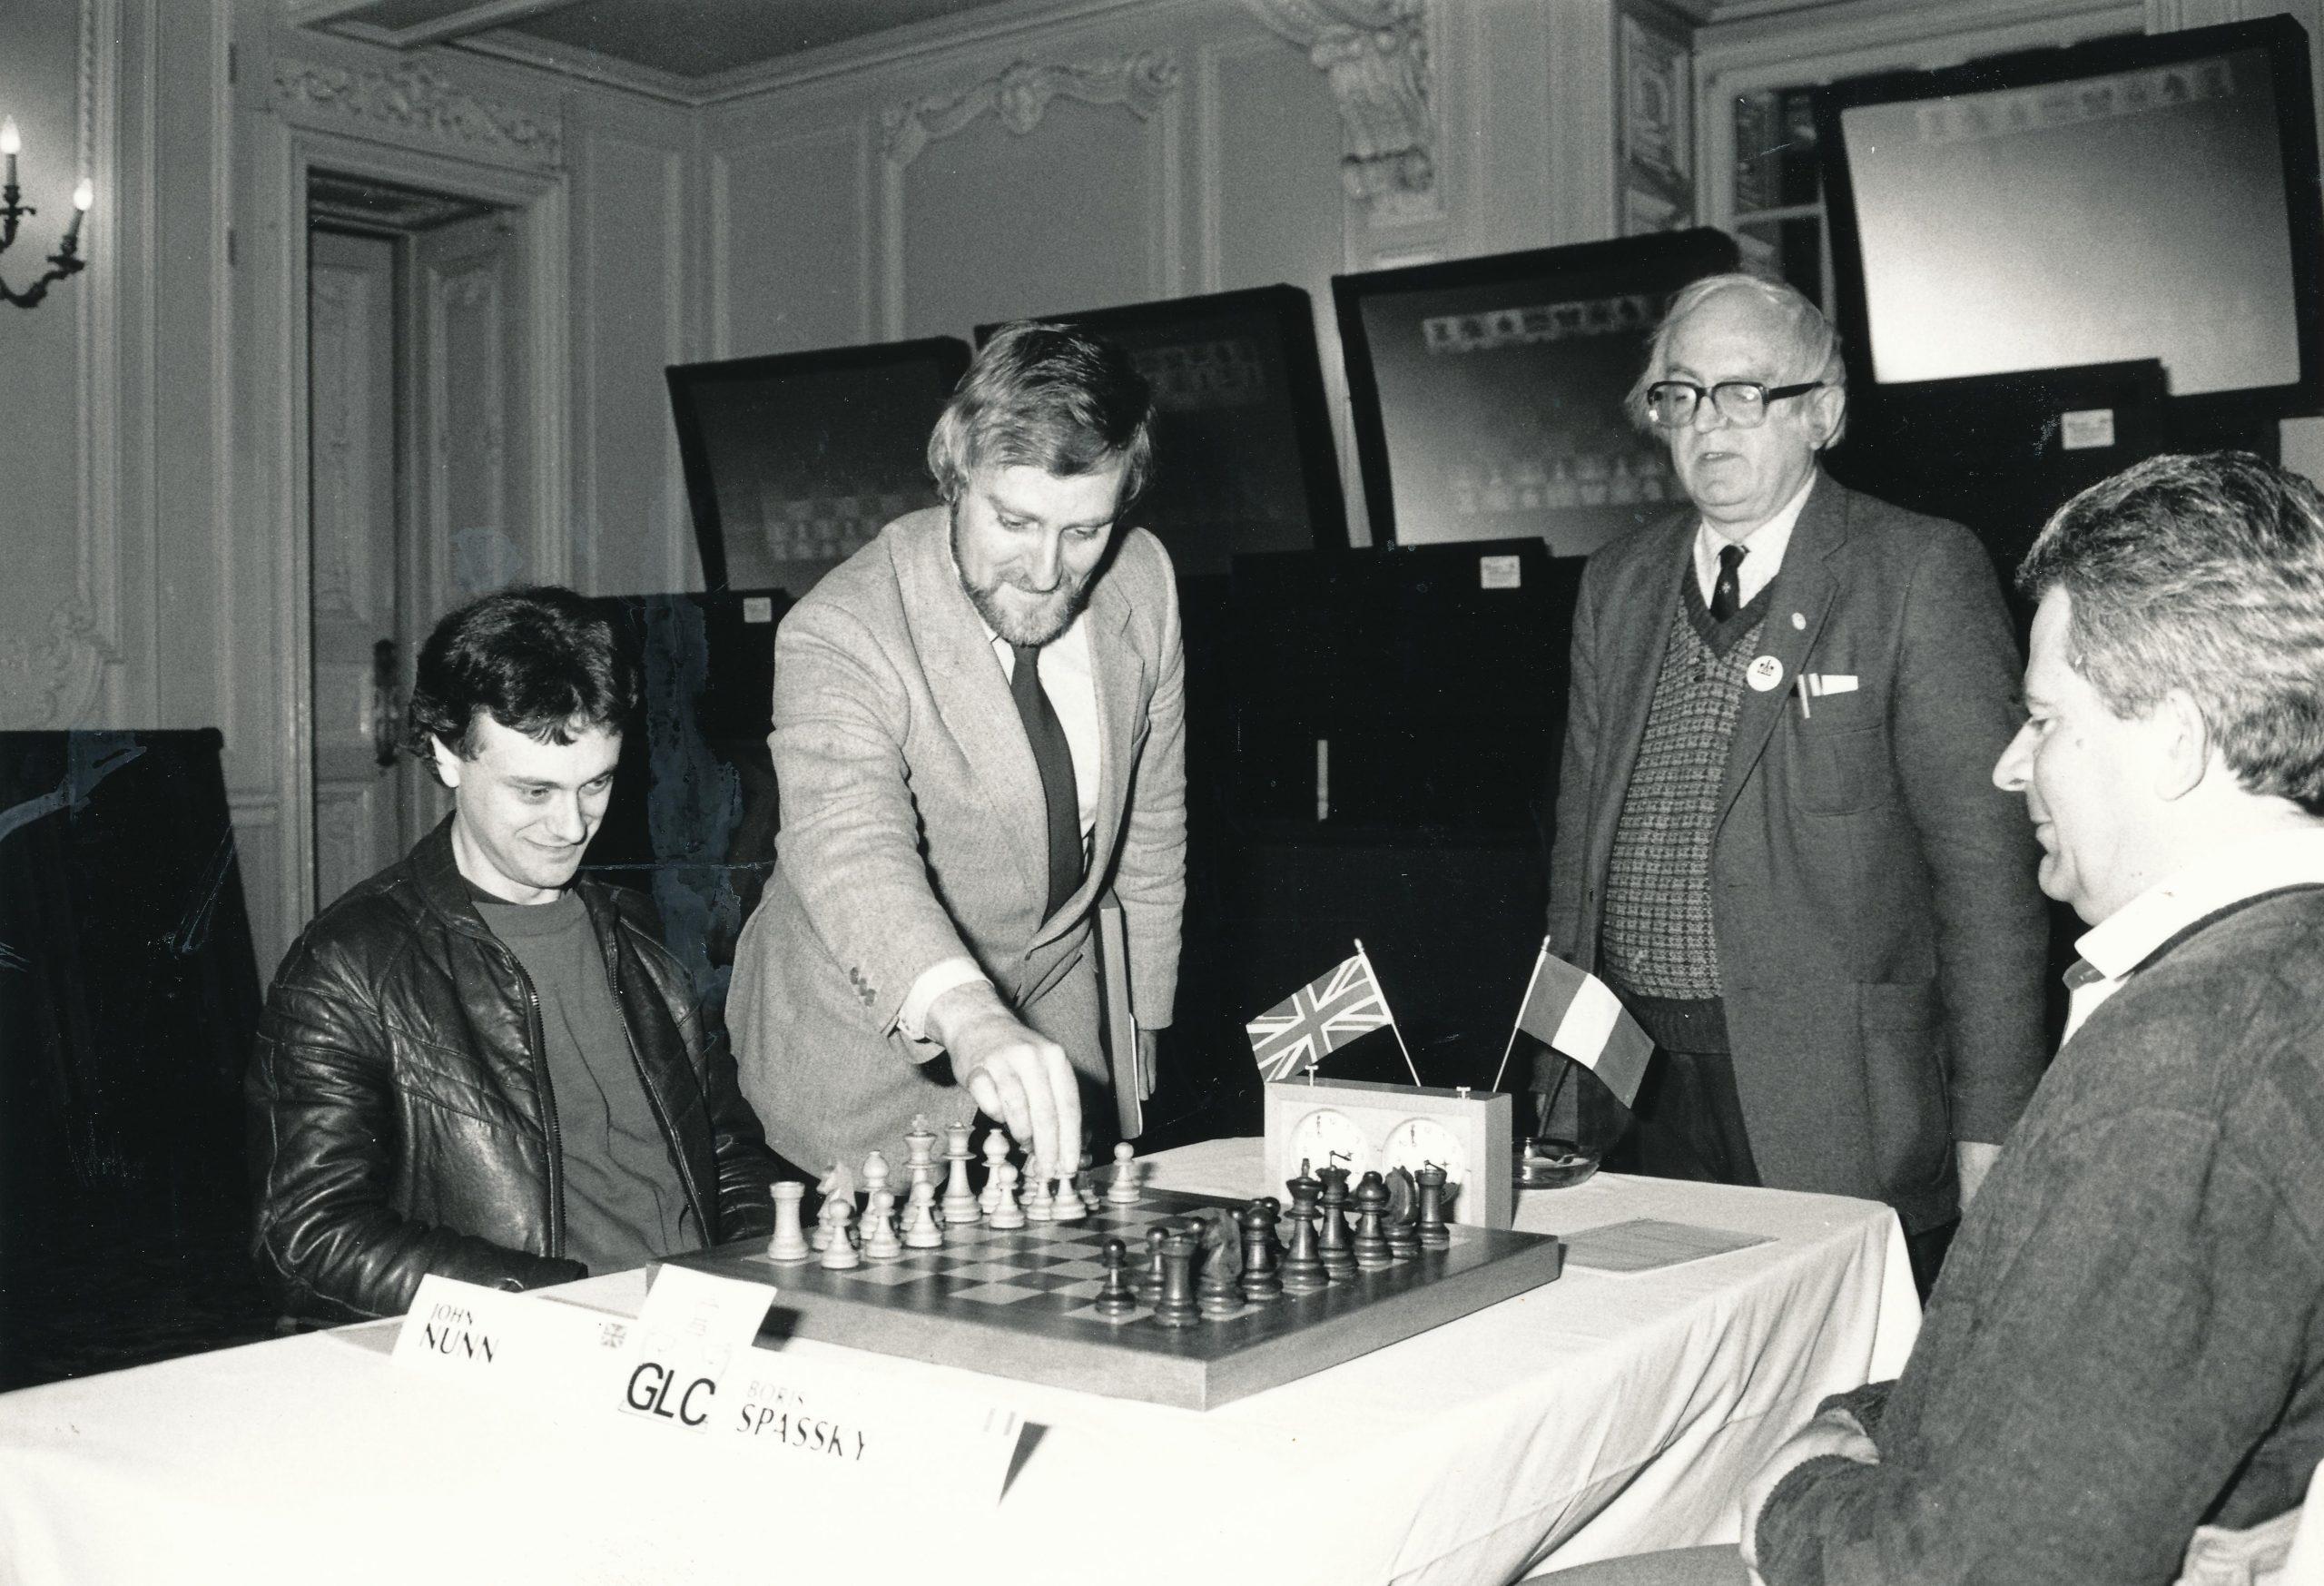 Bob with John Nunn and Boris Spassky at the GLC Masters